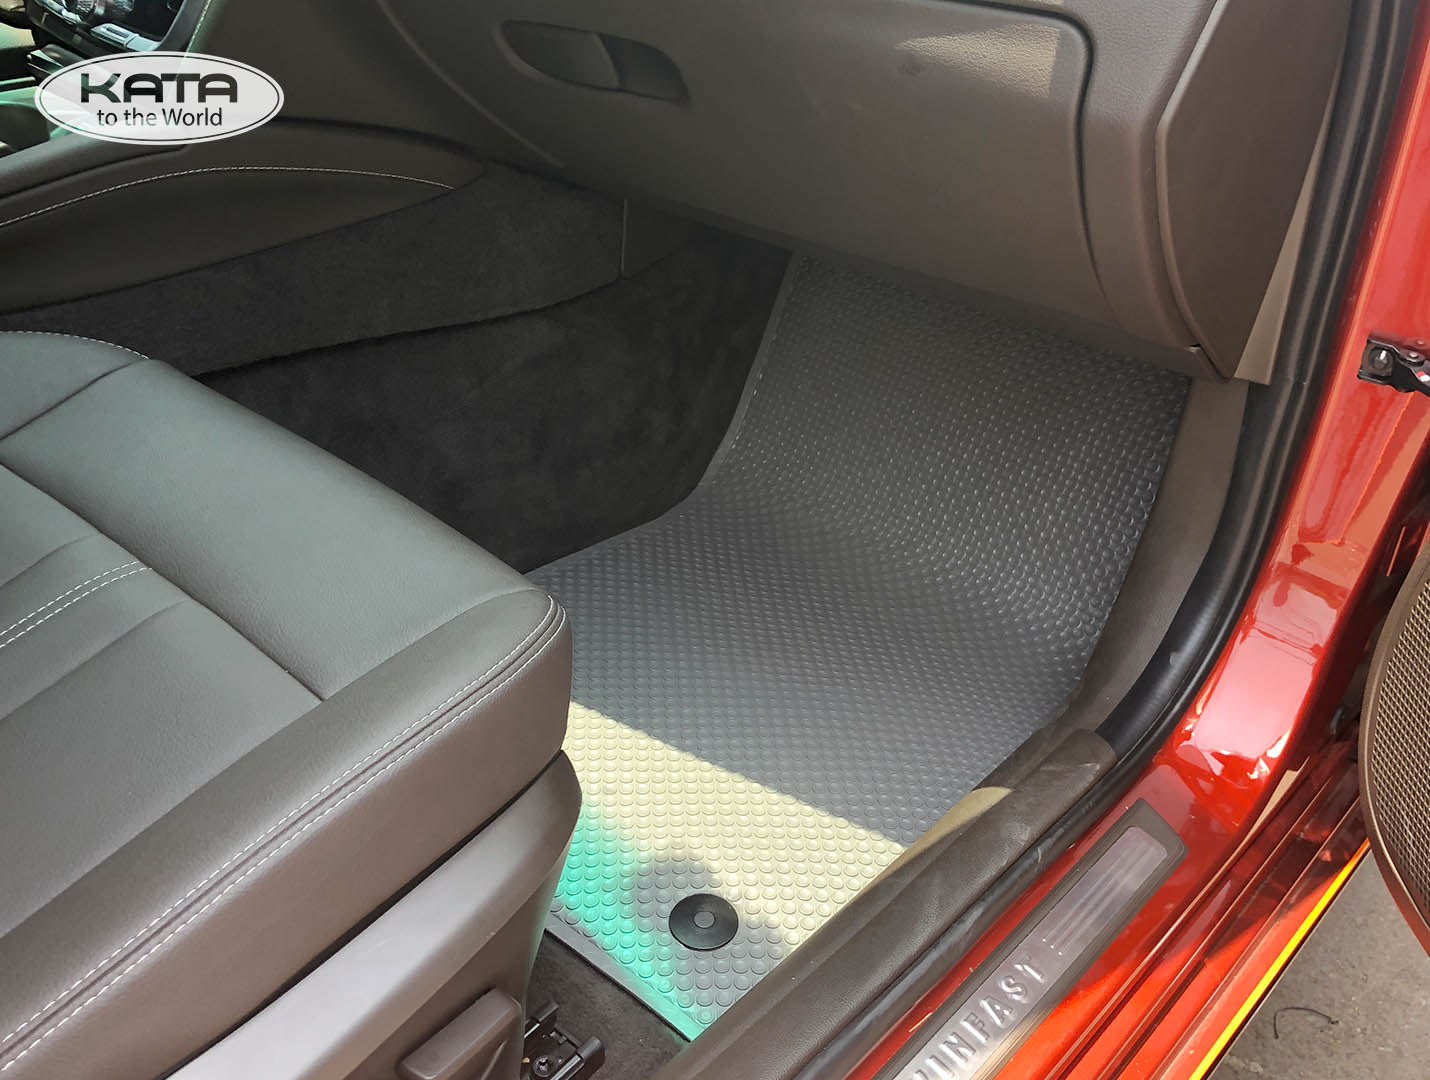 Thảm lót sàn Vinfast Lux A bản KATA Pro